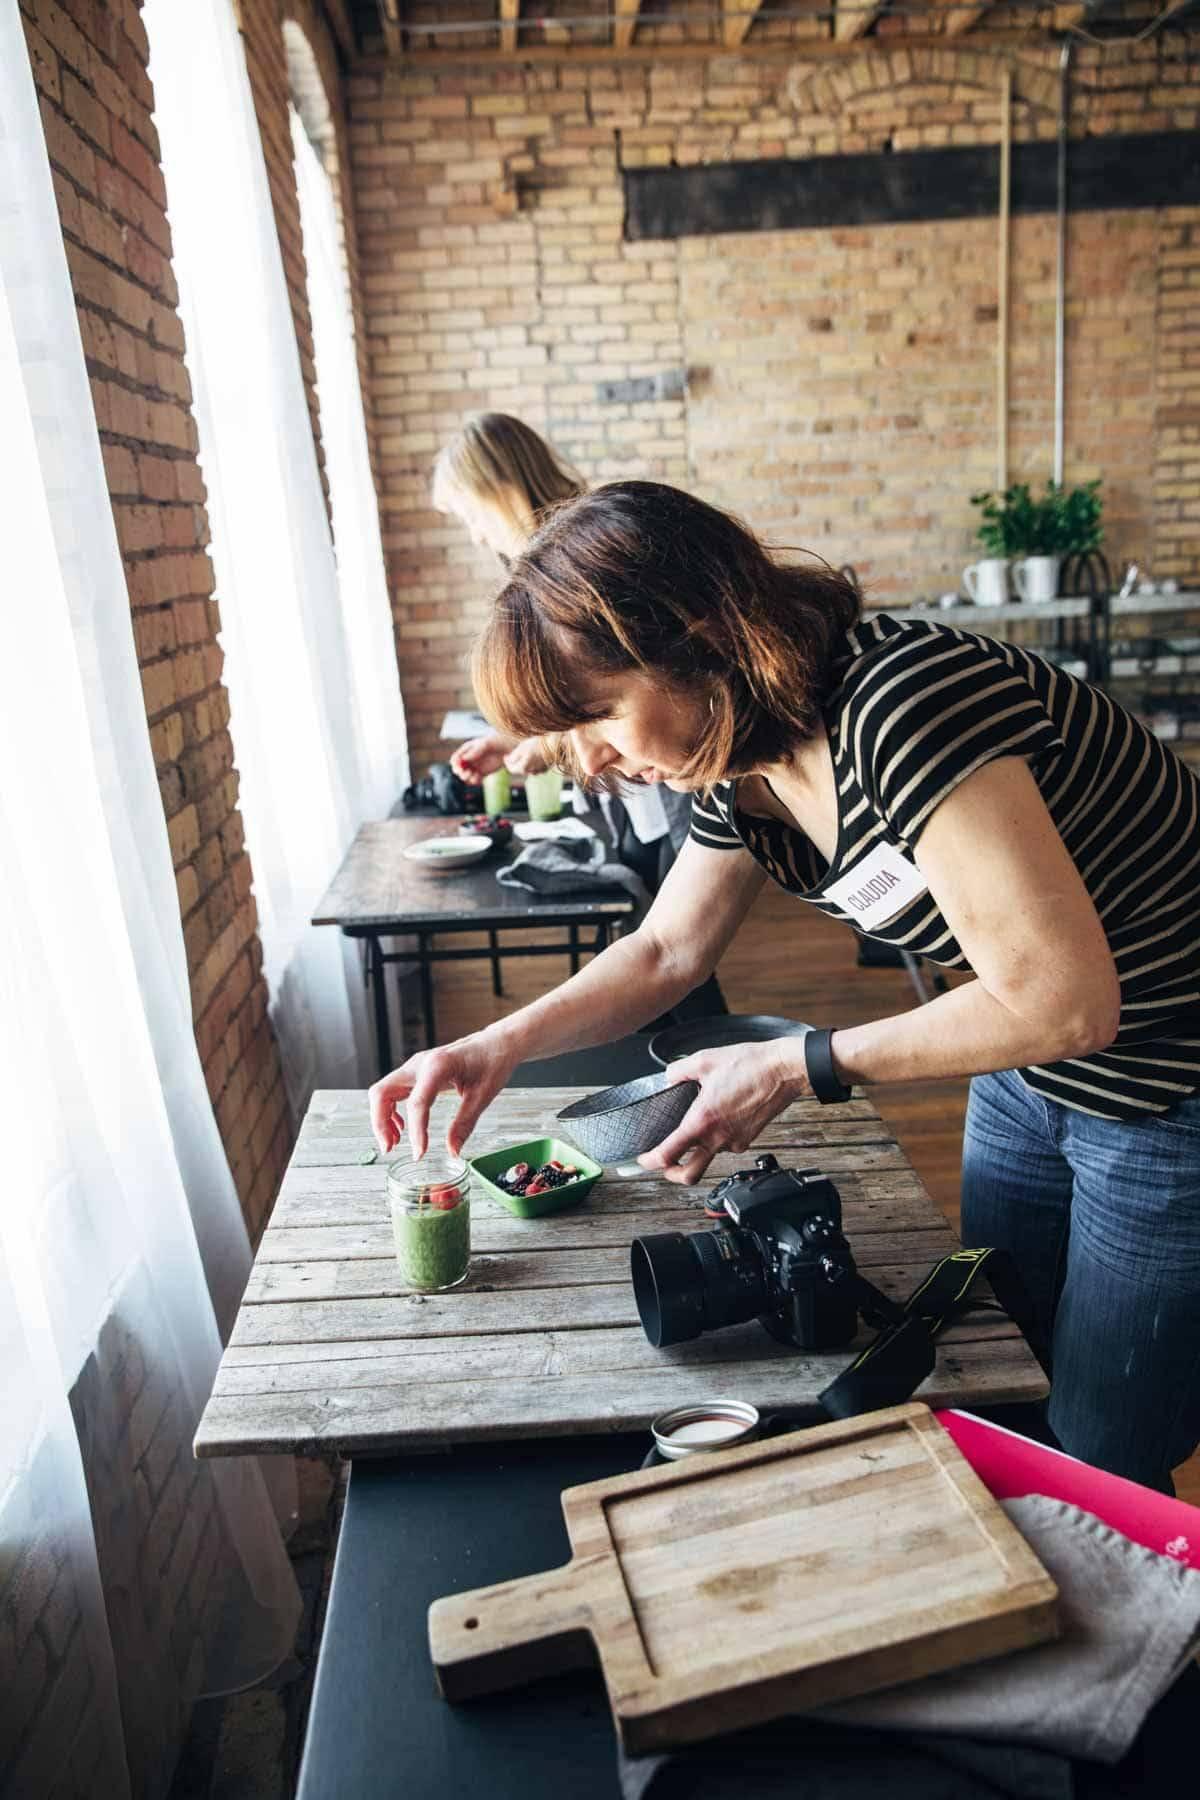 Minnesota Food Photography Workshops | pinchofyum.com